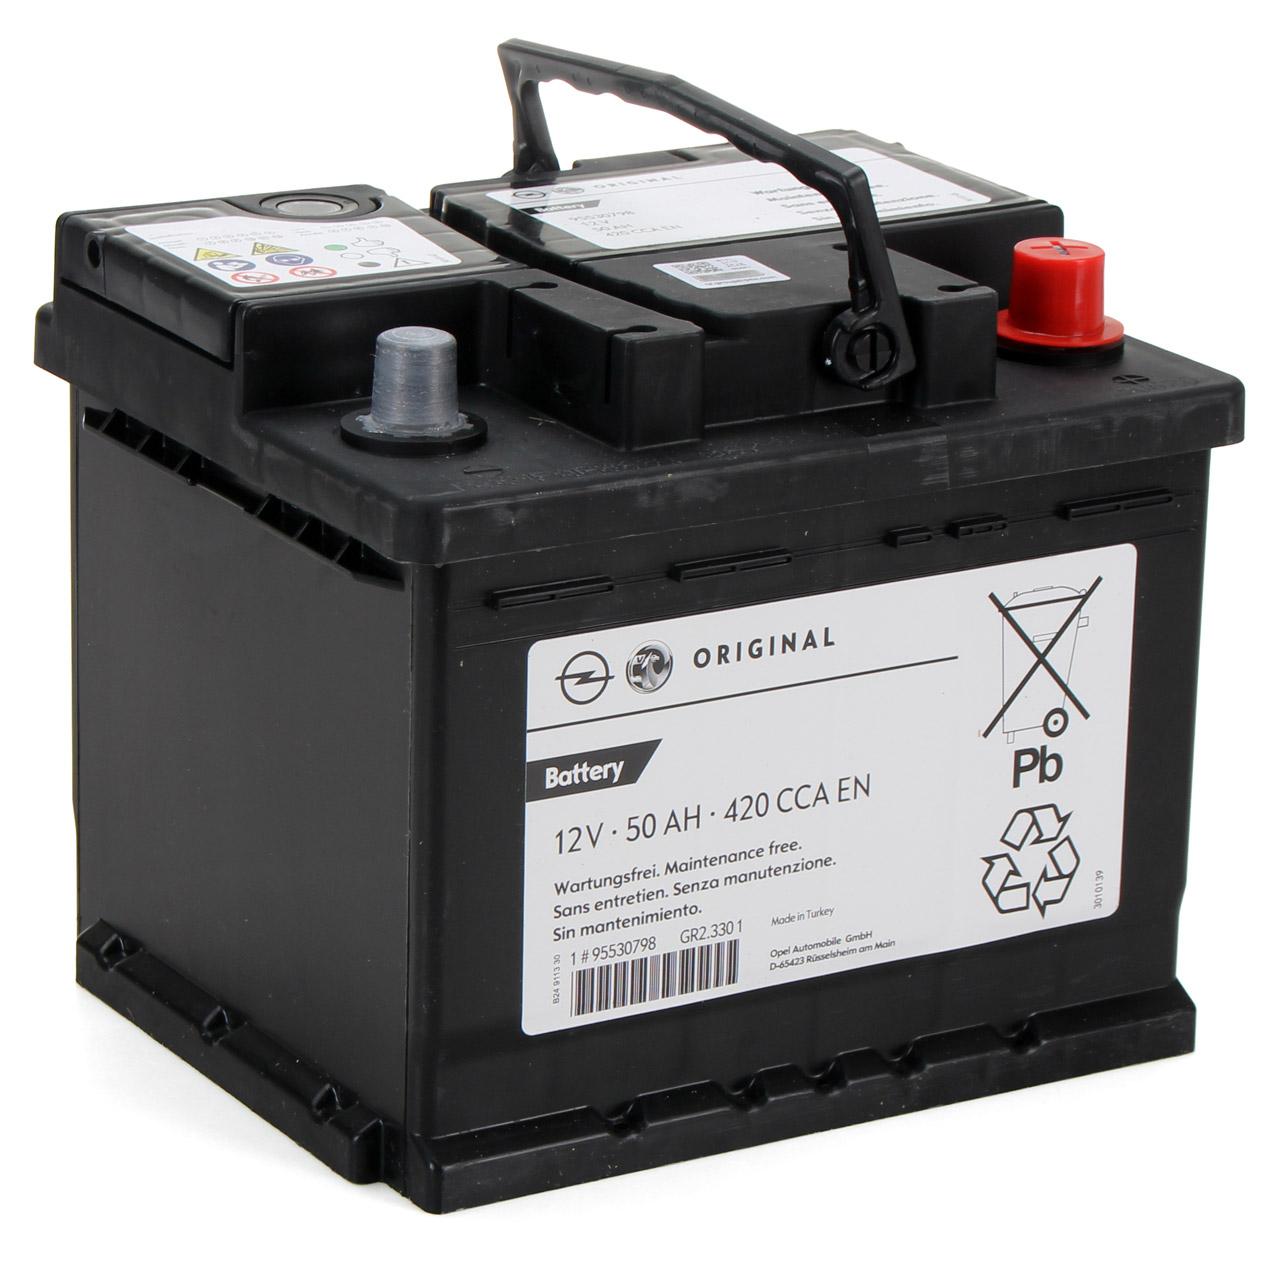 ORIGINAL GM Opel Autobatterie Starterbatterie 12V 50Ah 420 CCA EN 95527530